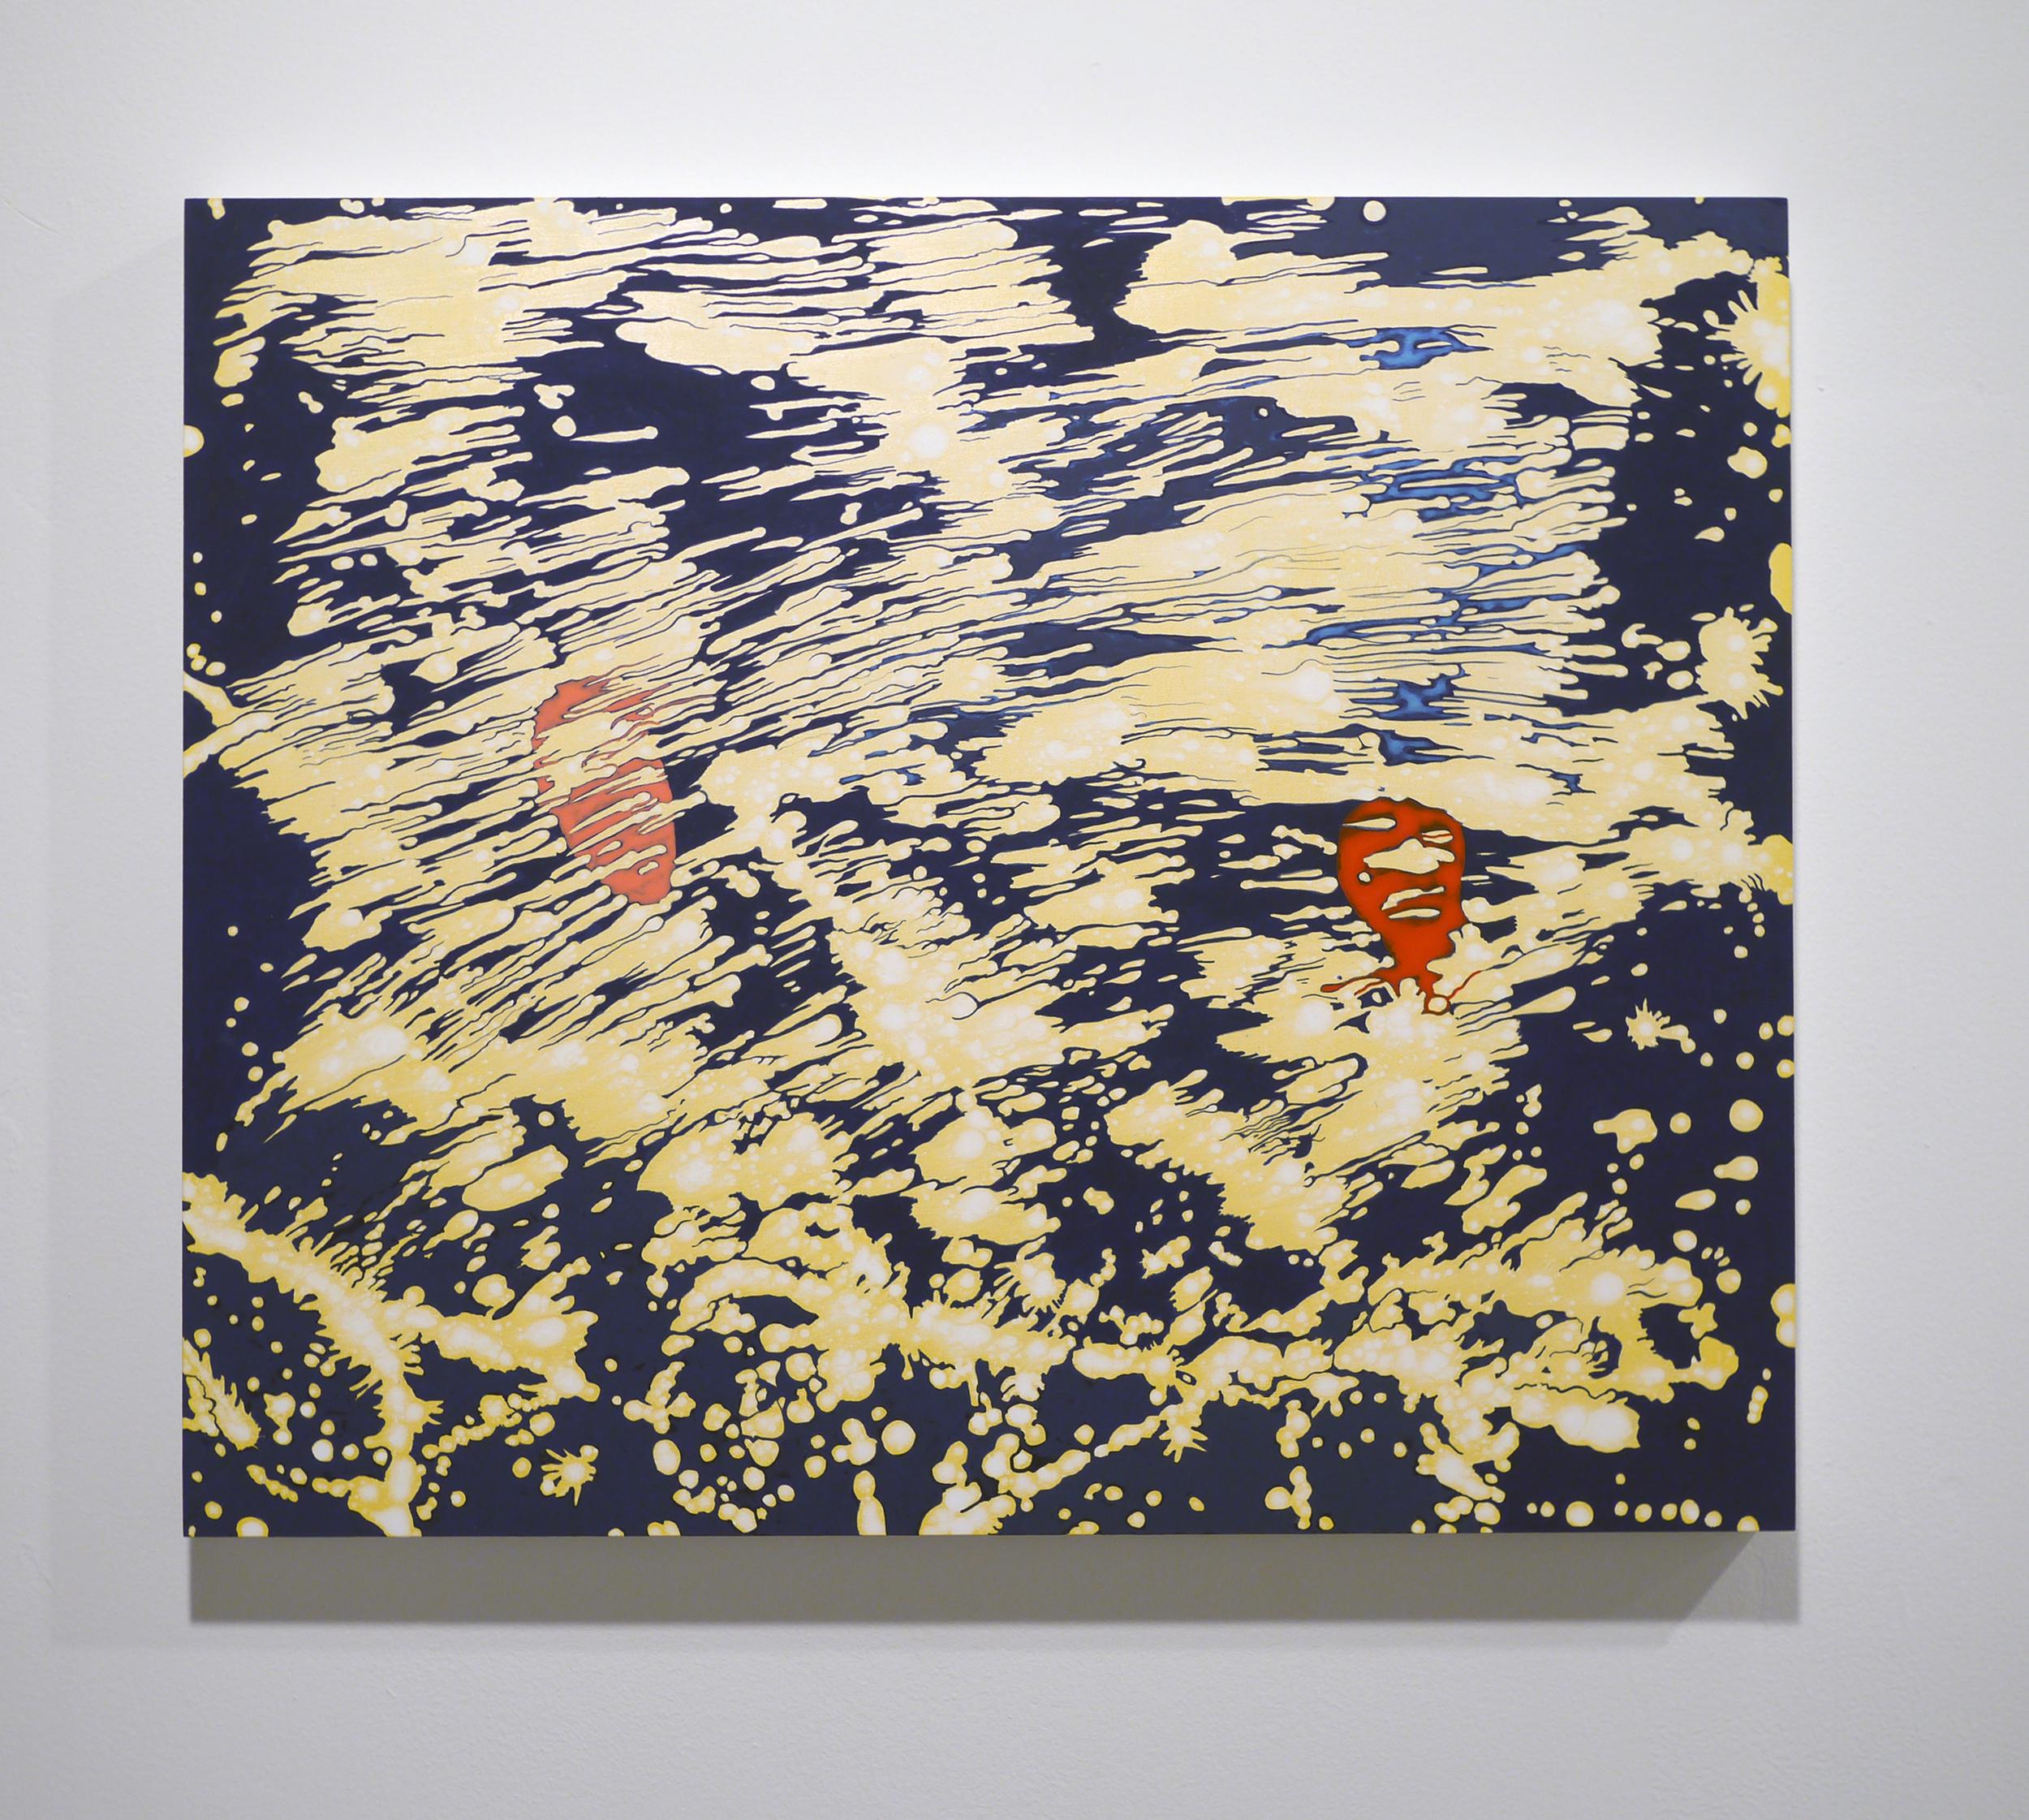 "Barbara Takenaga.  Pink and Red . Acrylic on wood panel. 20"" x 24"". 2012."